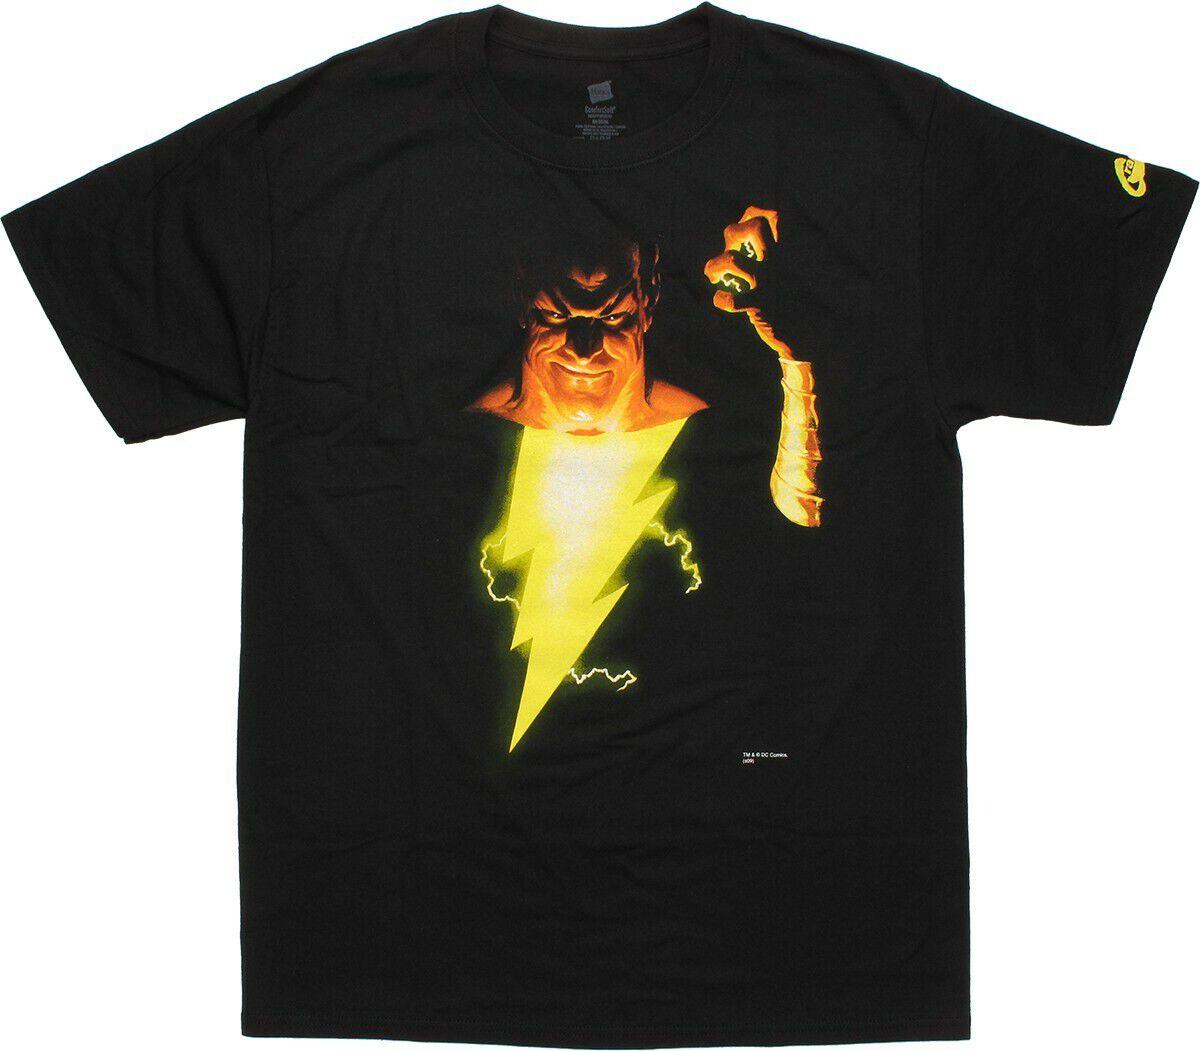 Shazam Black Adam Fist T-Shirt